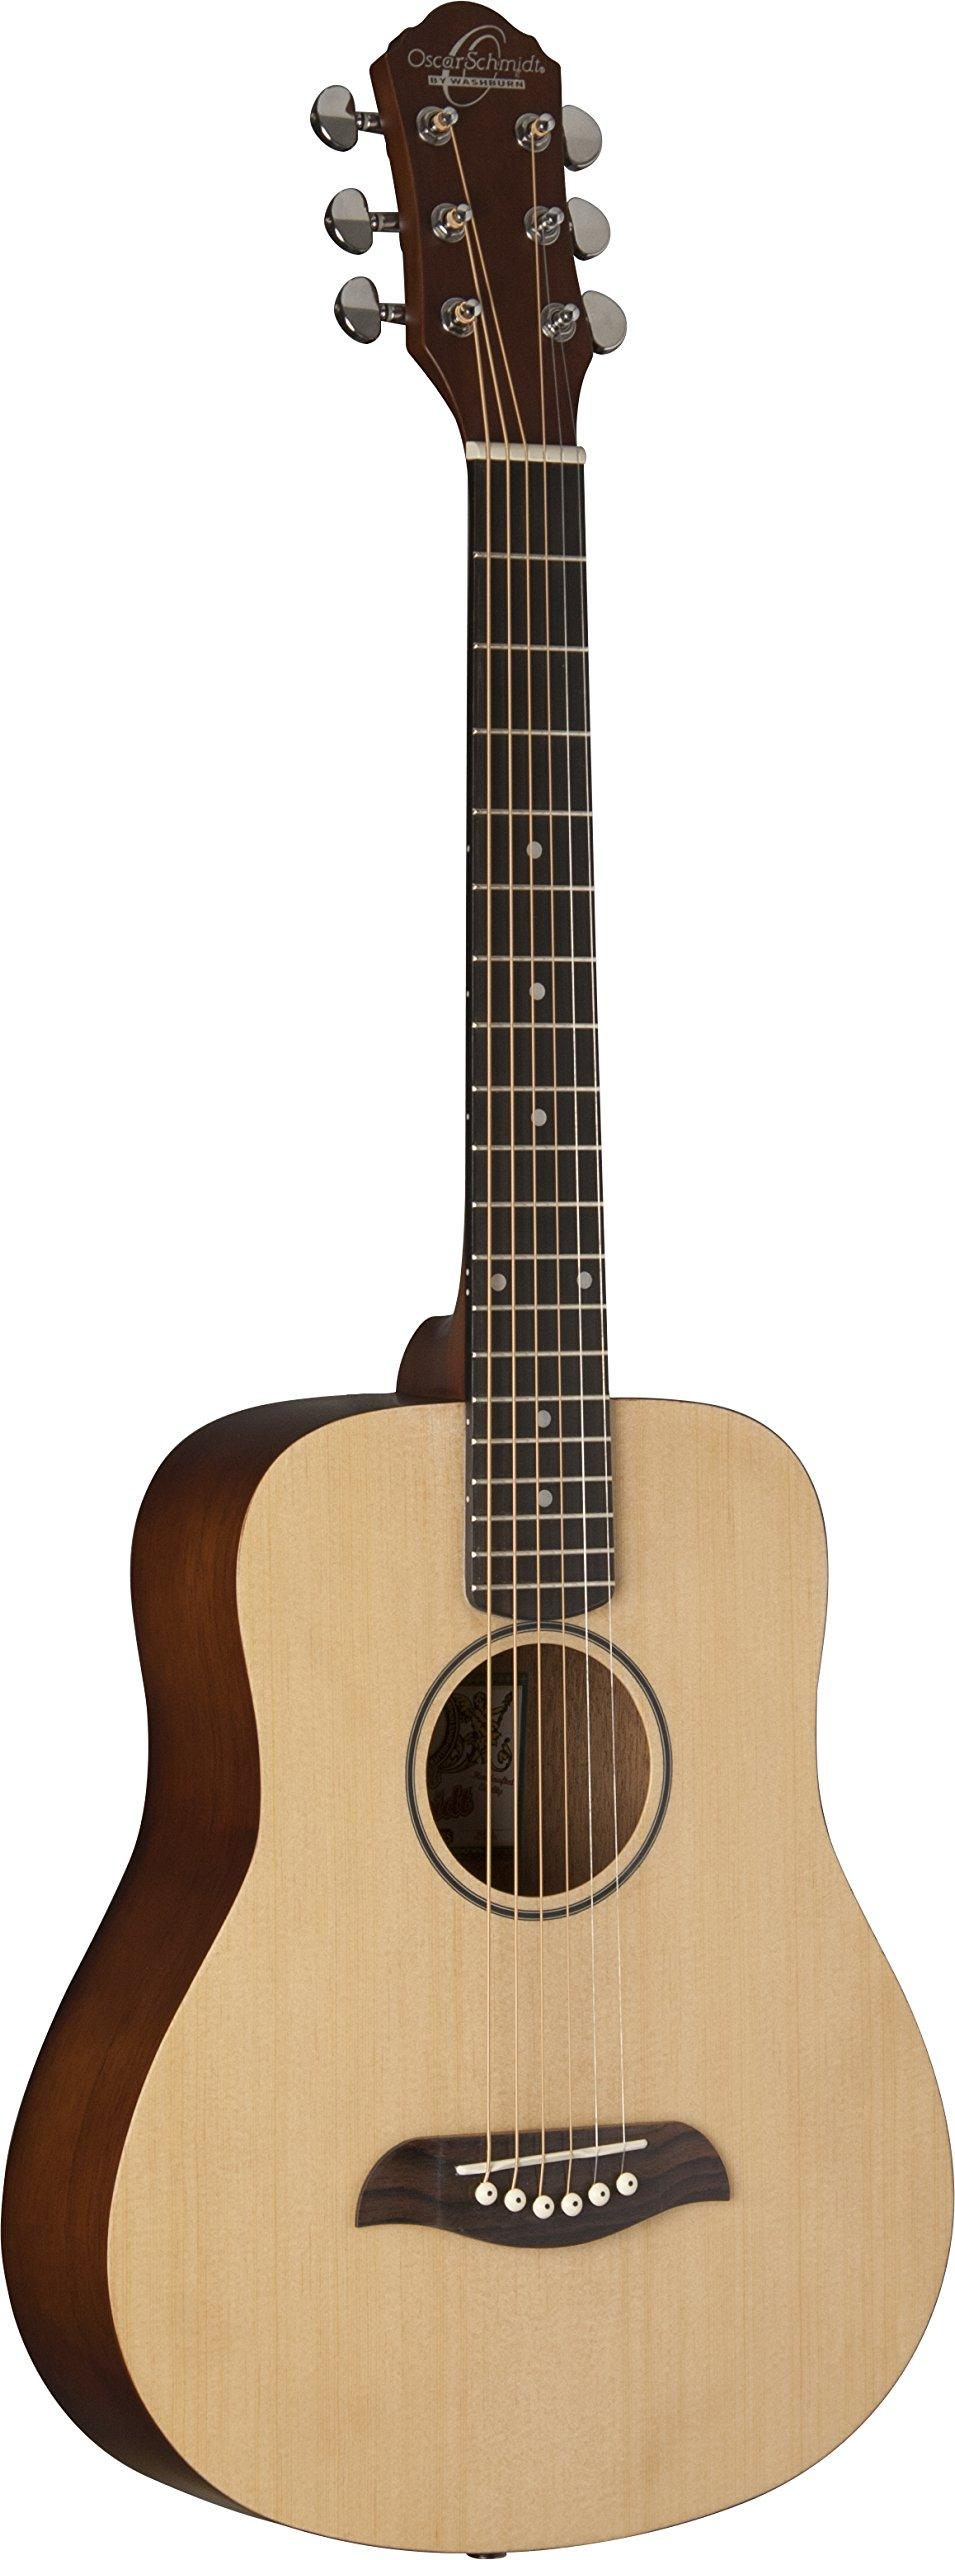 Oscar Schmidt Mini Travel Guitar, Spruce Top OGM8